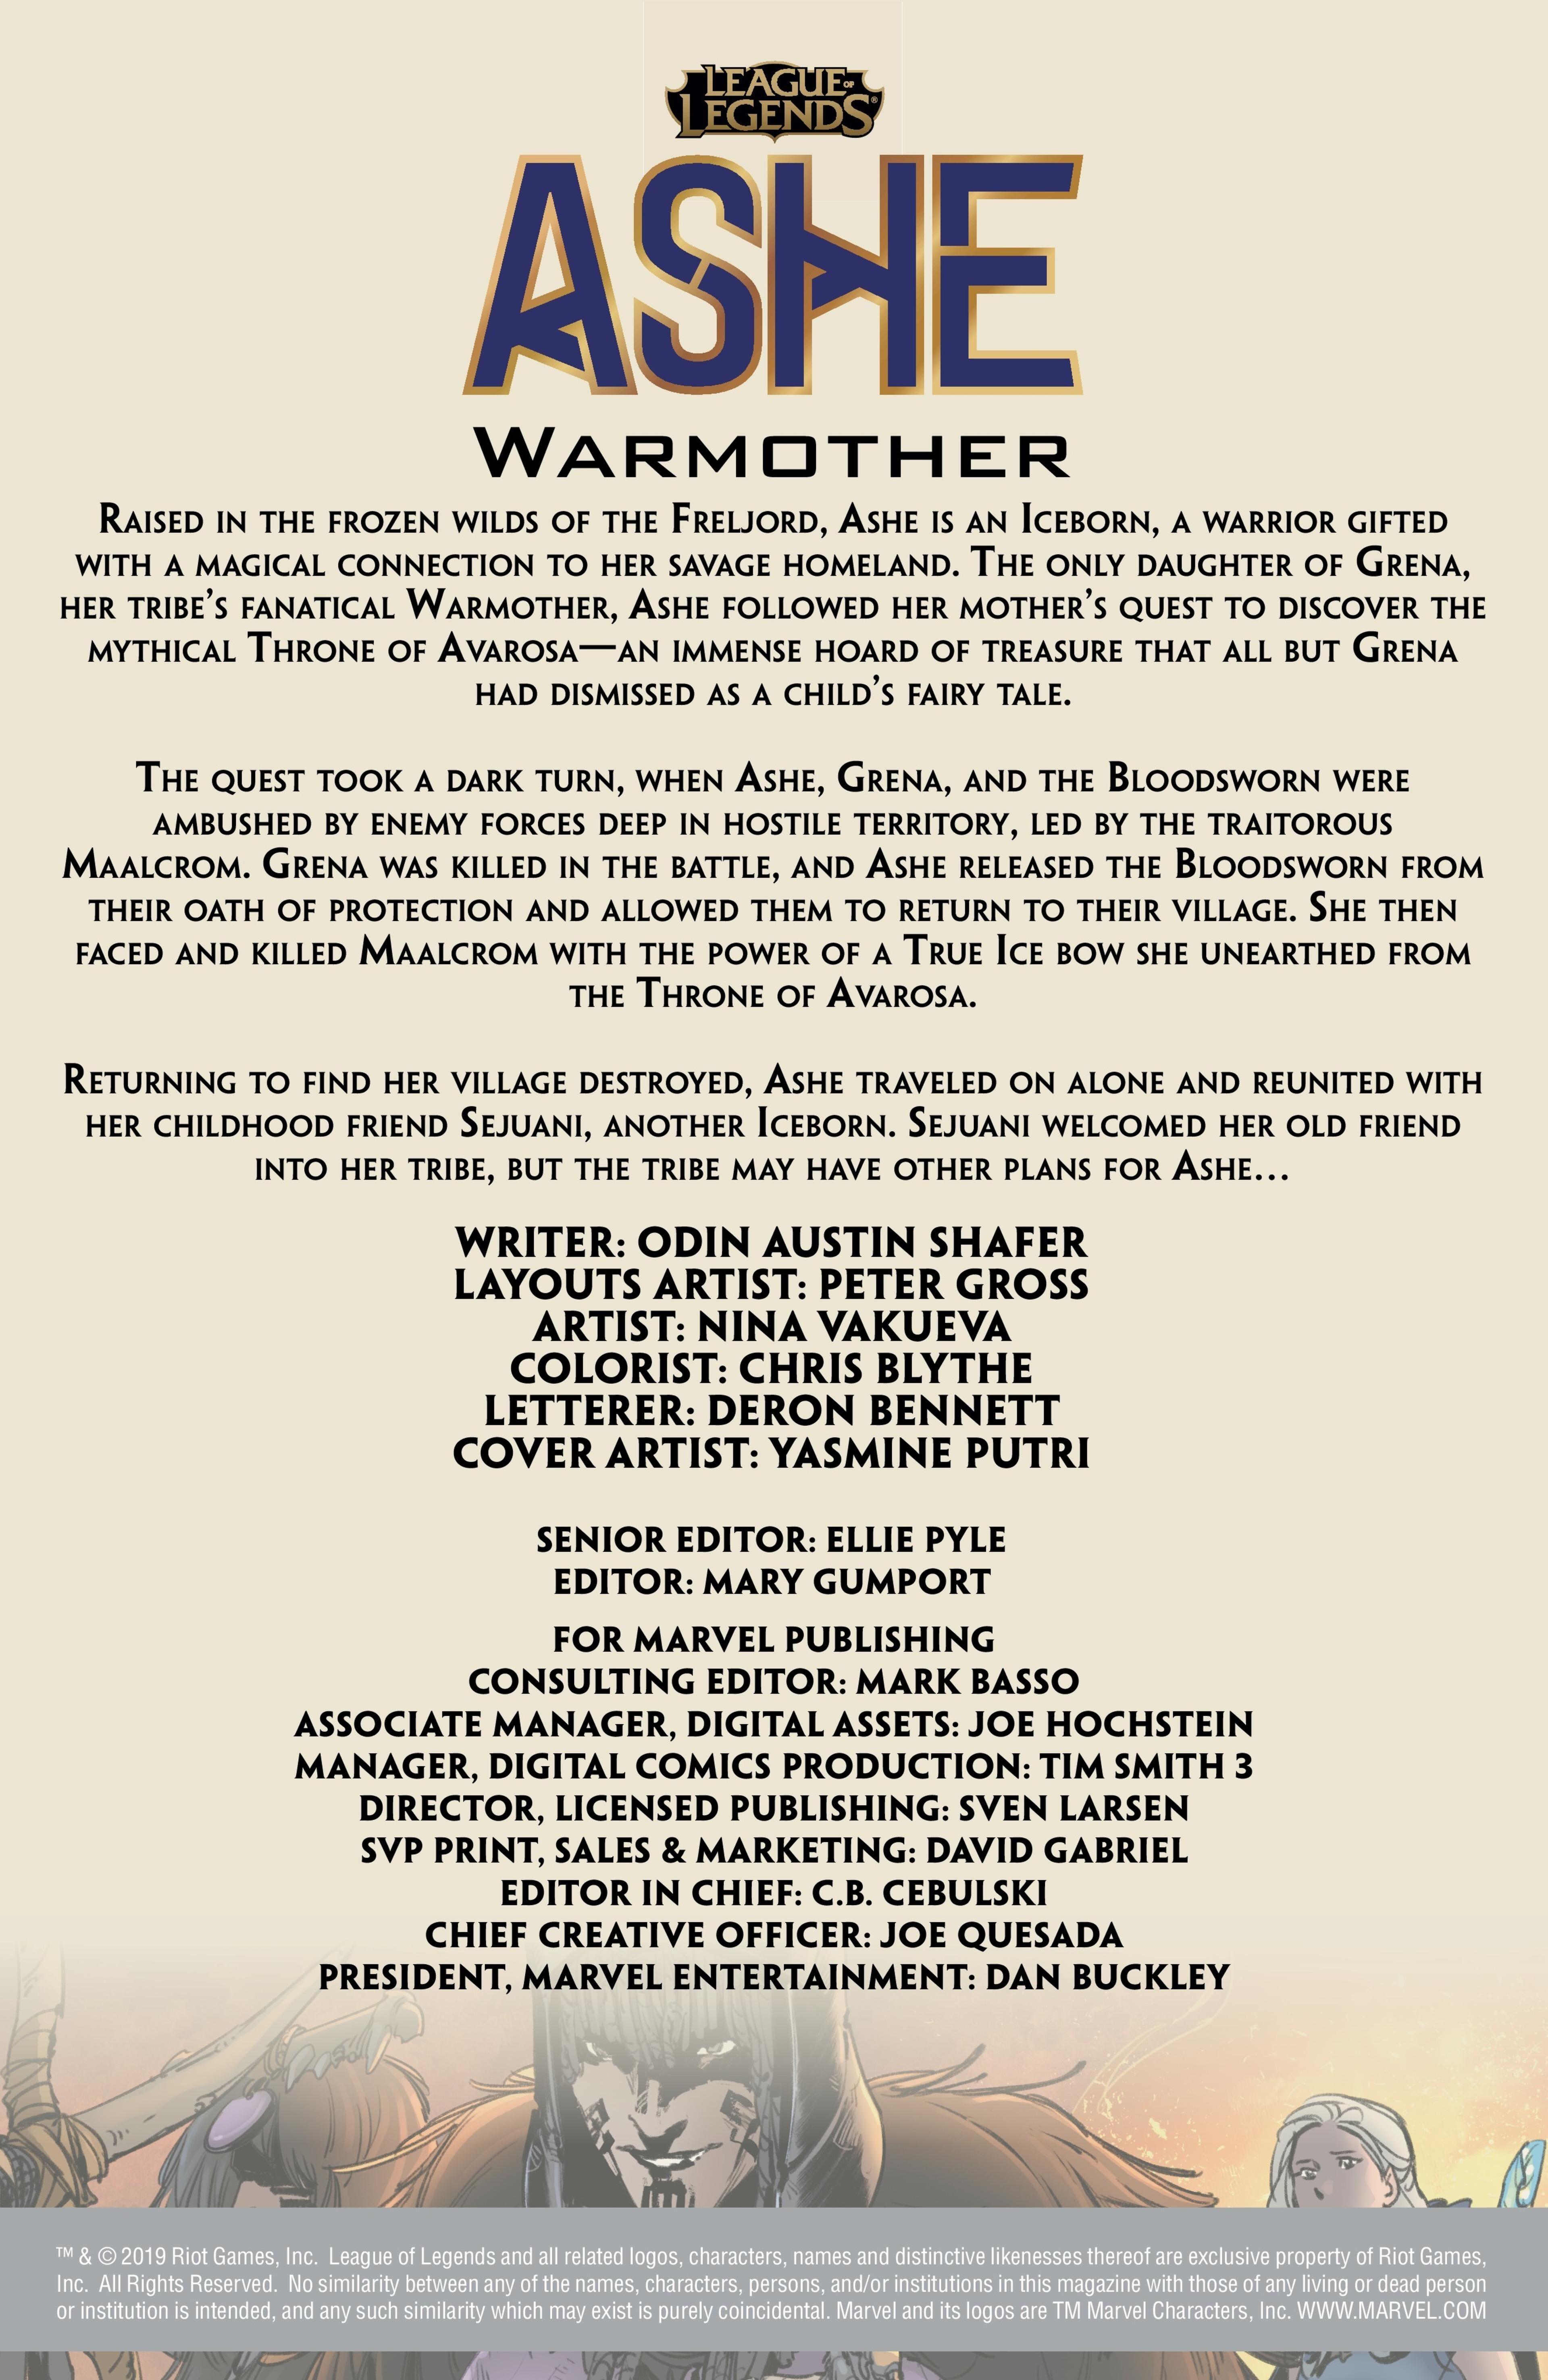 Ashe Warmother 4 pr01.jpg